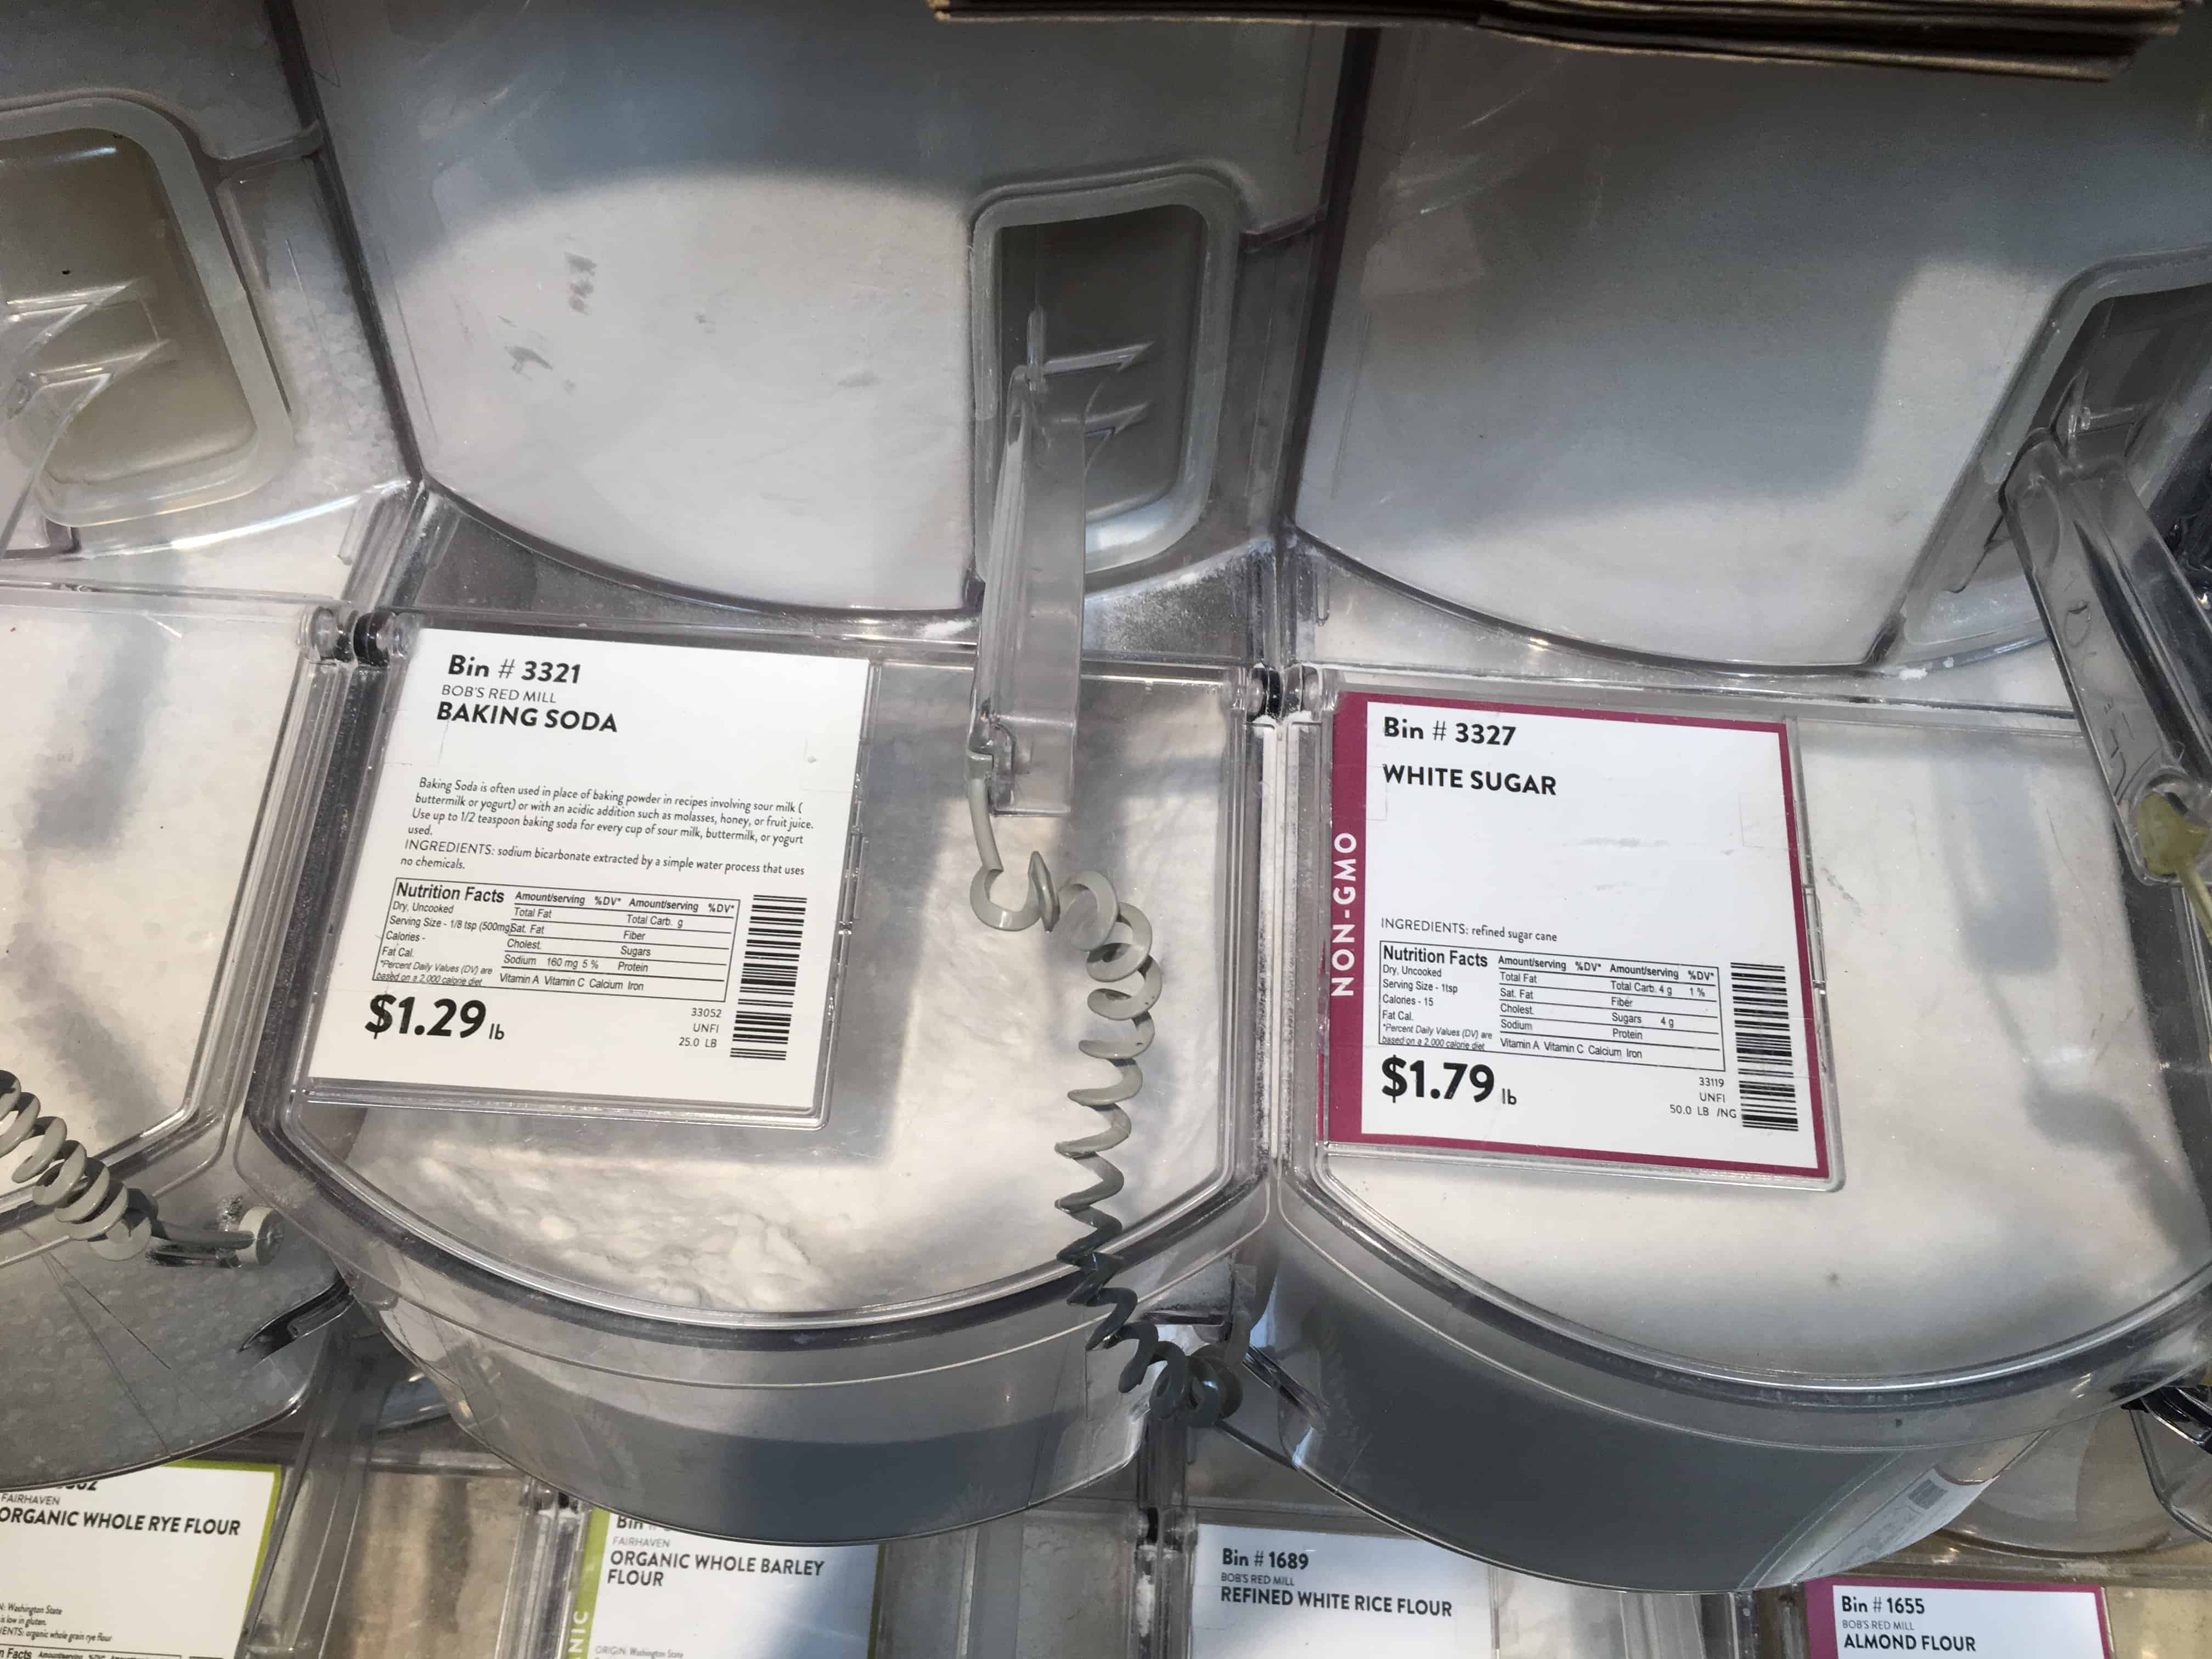 Bulk bin of Baking Soda and Sugar from PCC Market in Redmond, WA. https://trimazing.com/